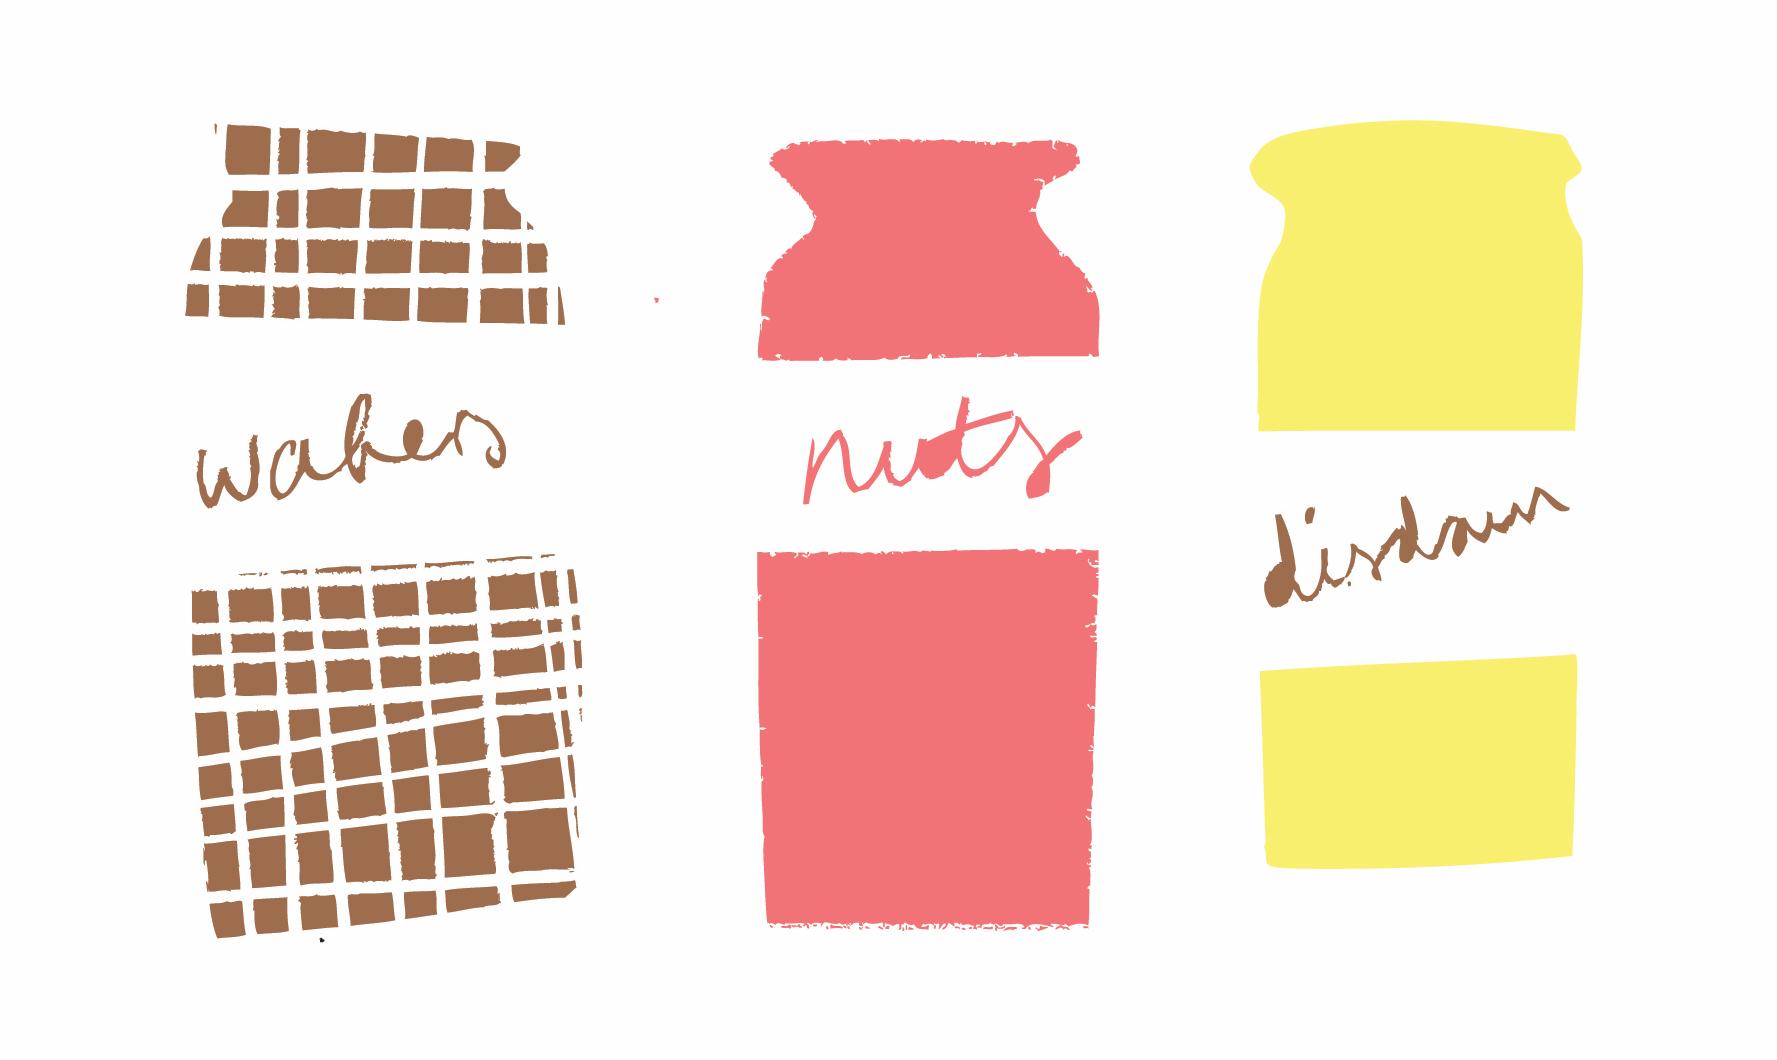 wafers, nuts, disdain